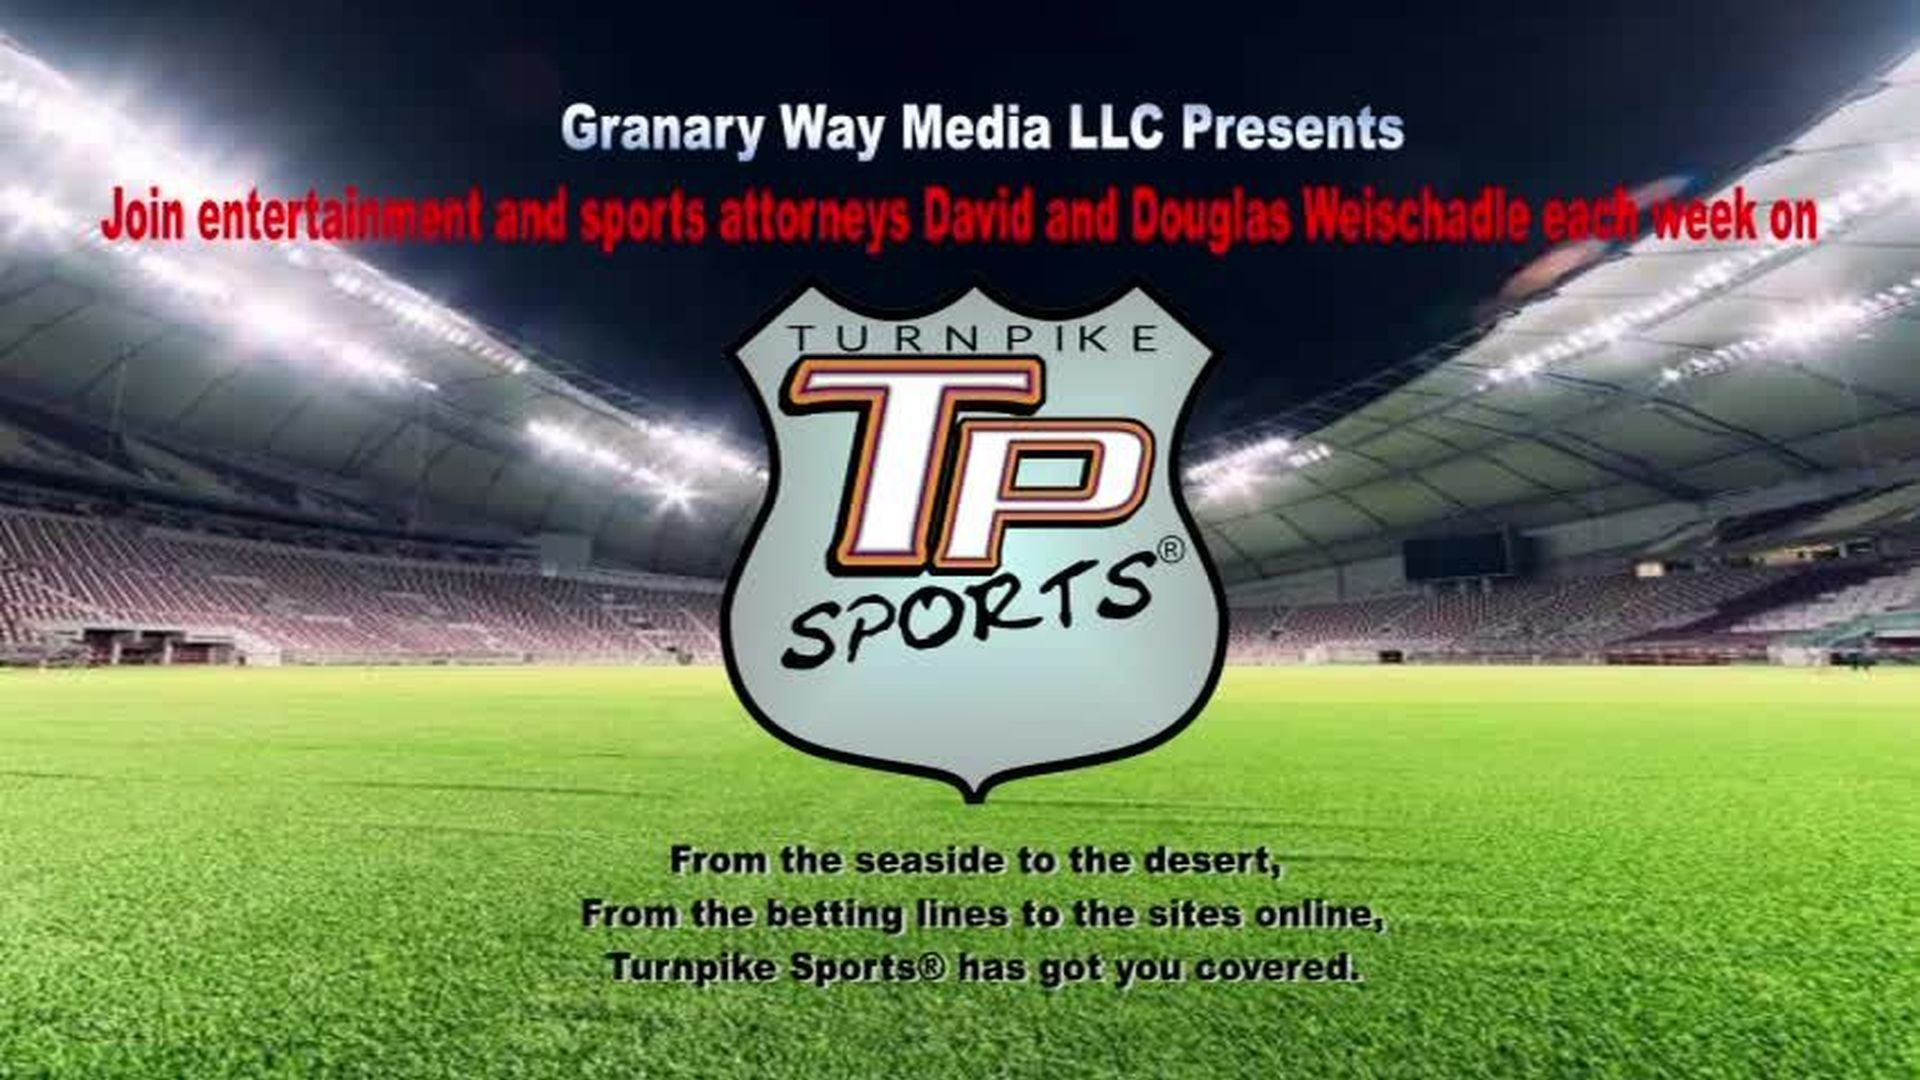 Turnpike Sports® - S 3 - Ep 27